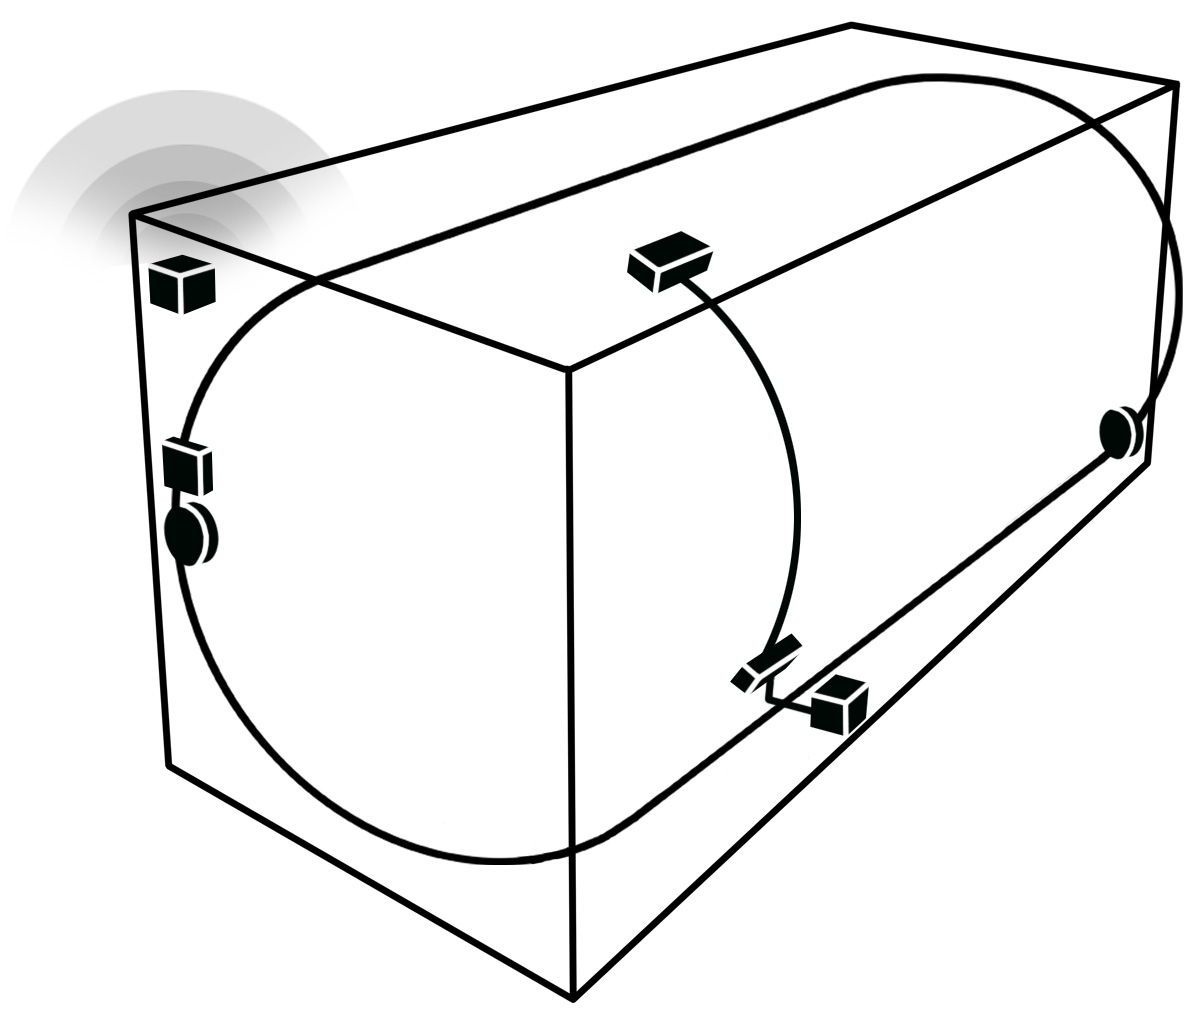 sensor-monitoring-Peacock-containers-flat.jpg